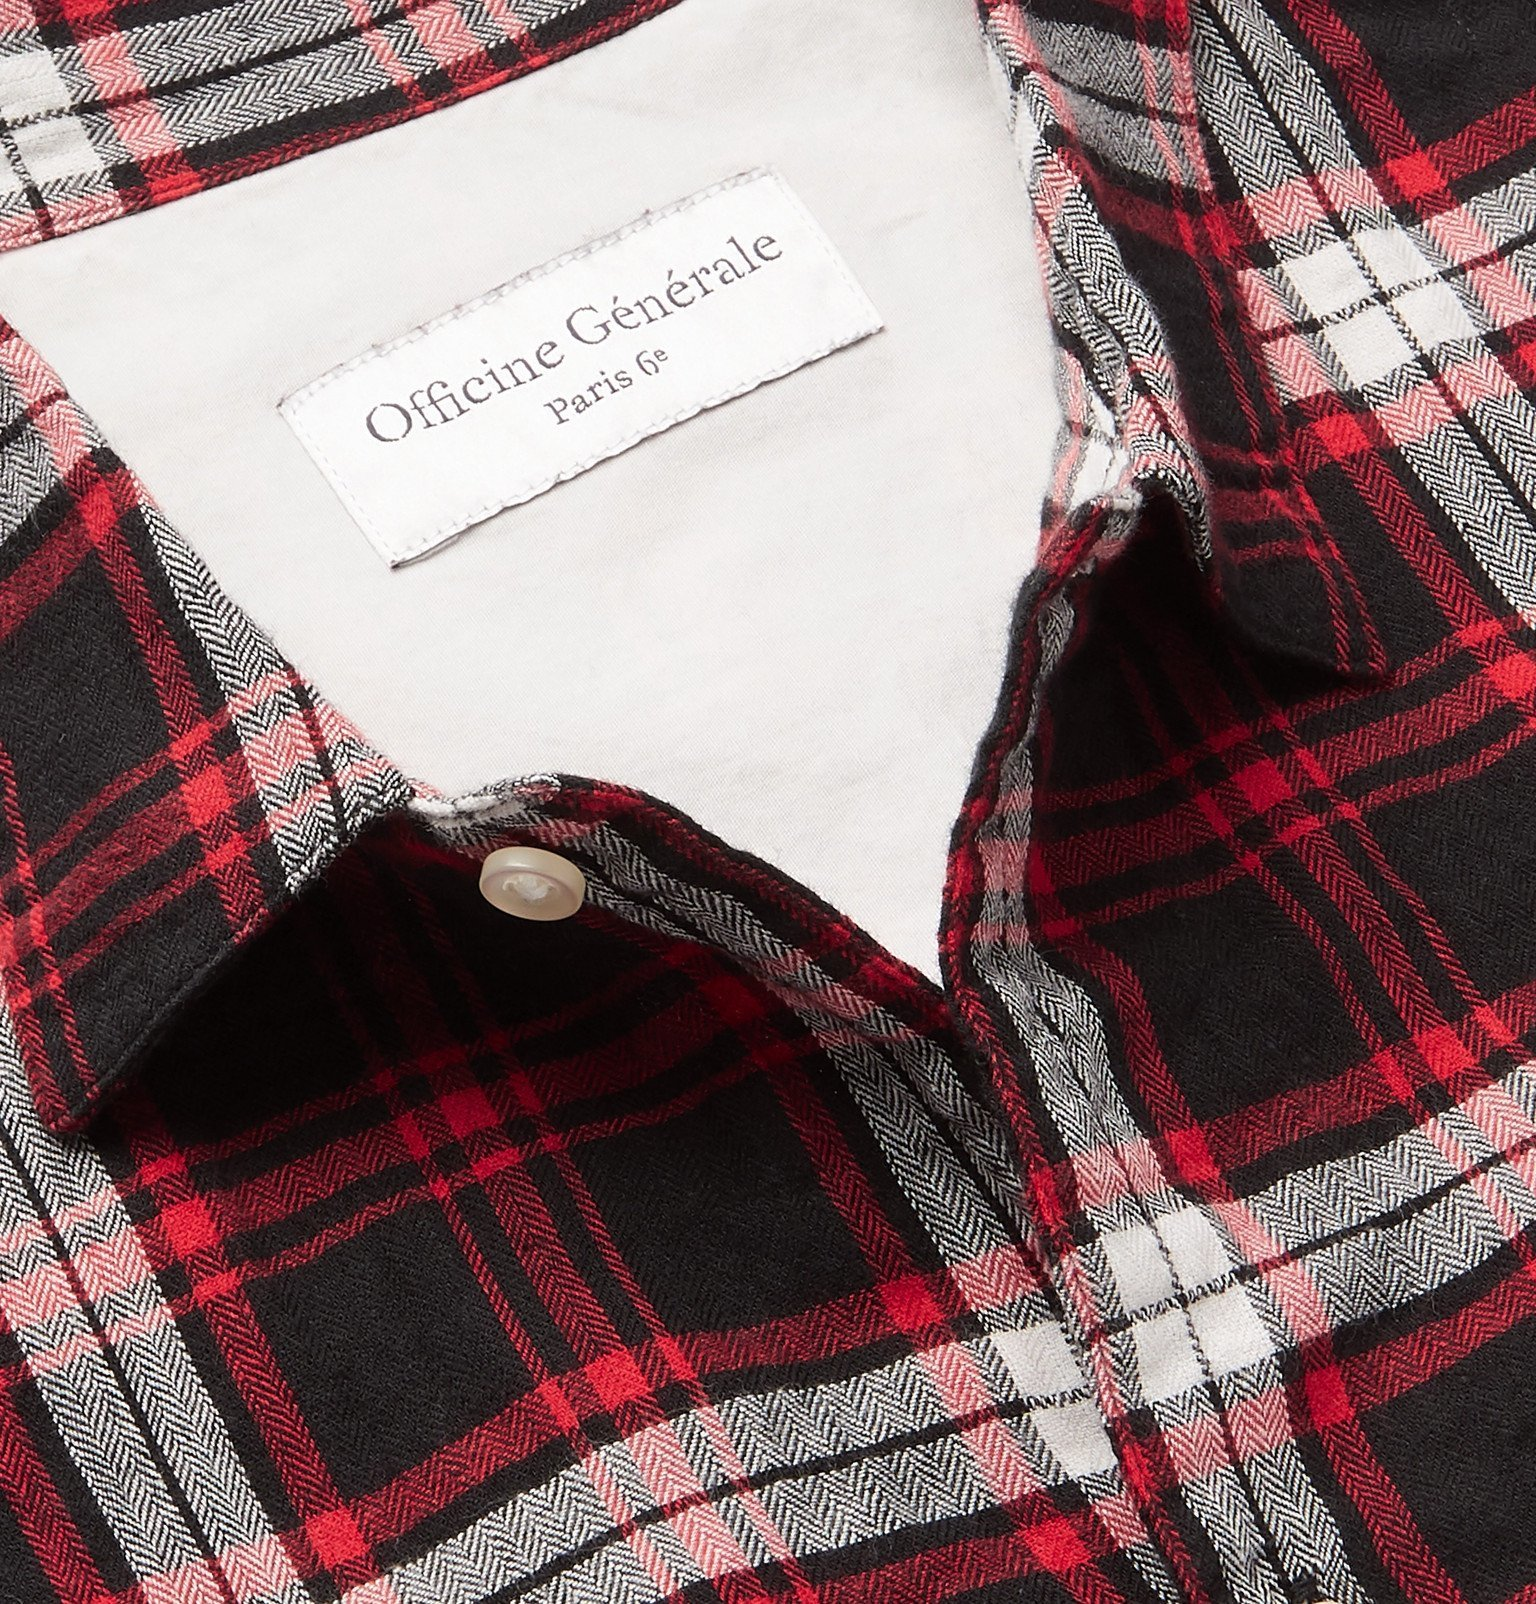 Officine Generale - Checked Cotton-Blend Flannel Shirt - Black